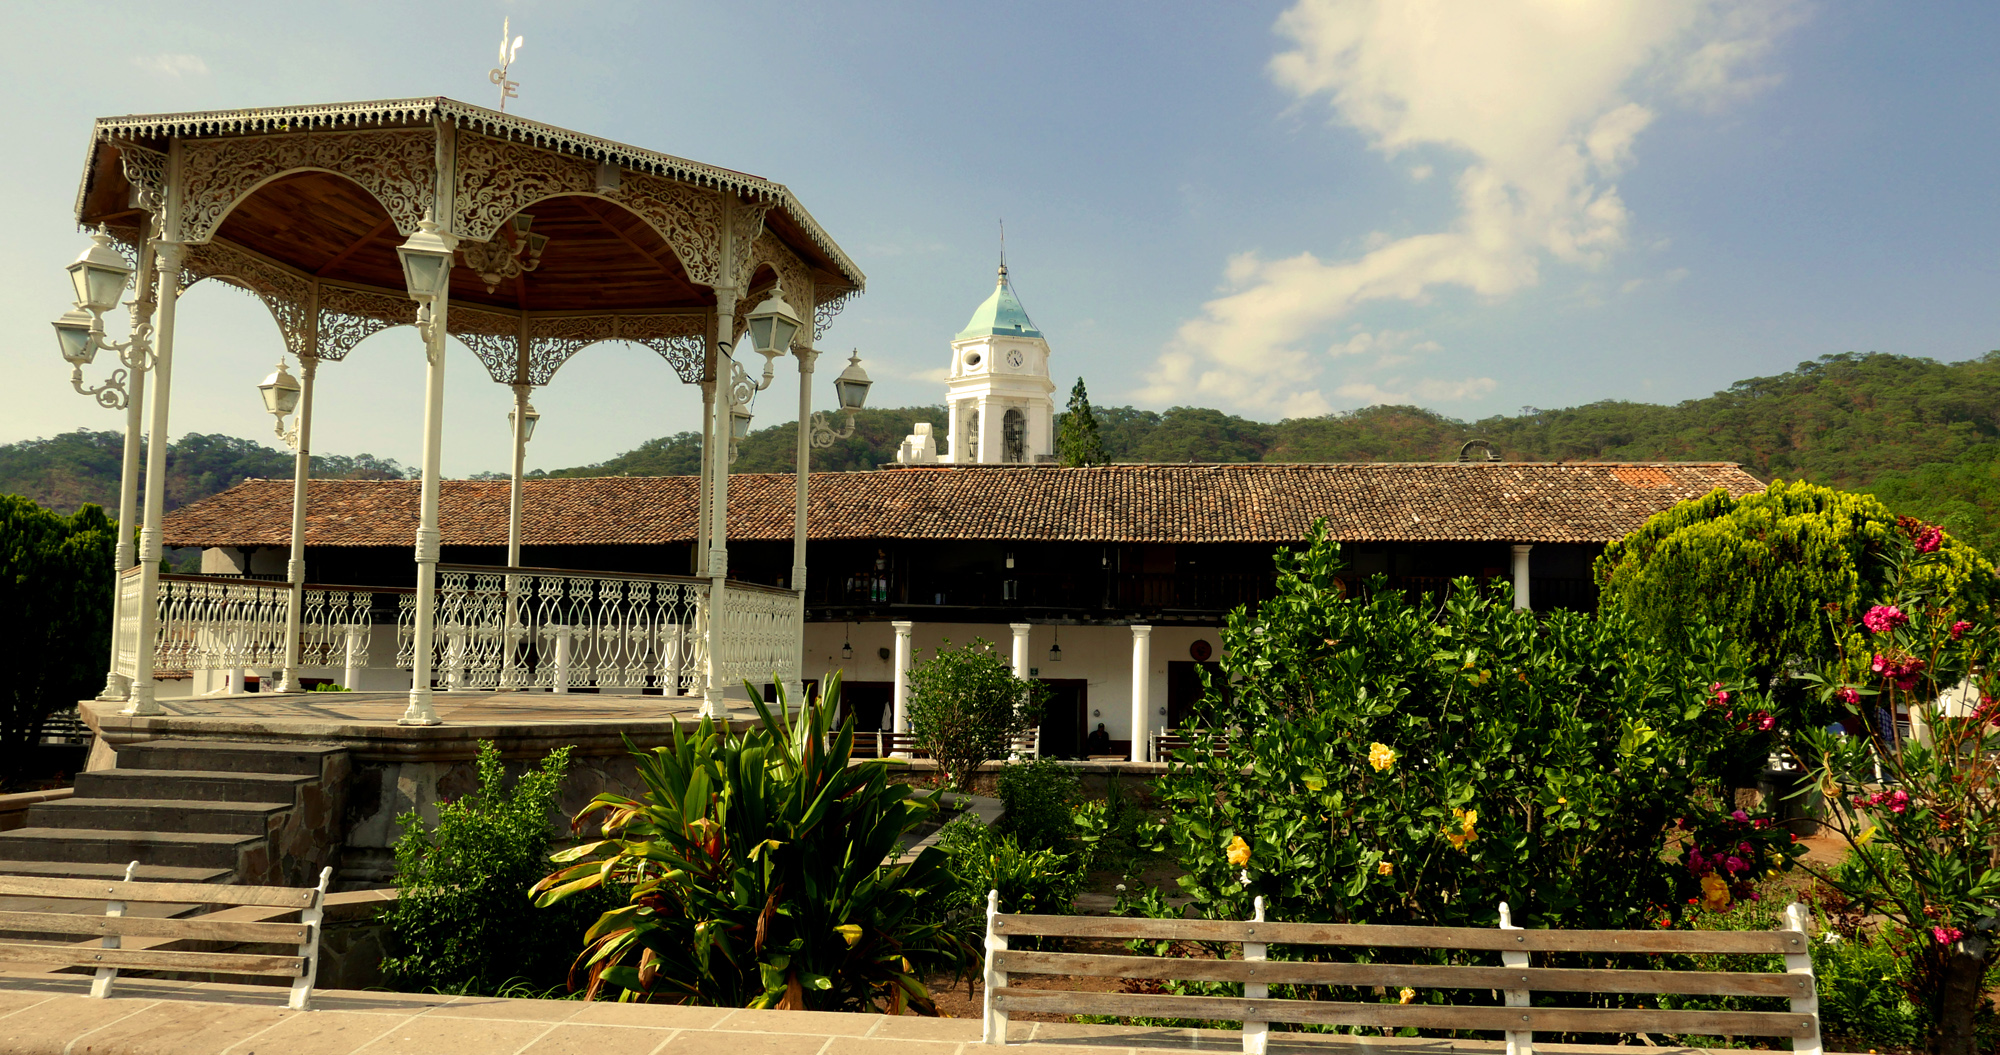 San Sebastian Mexico Plaza